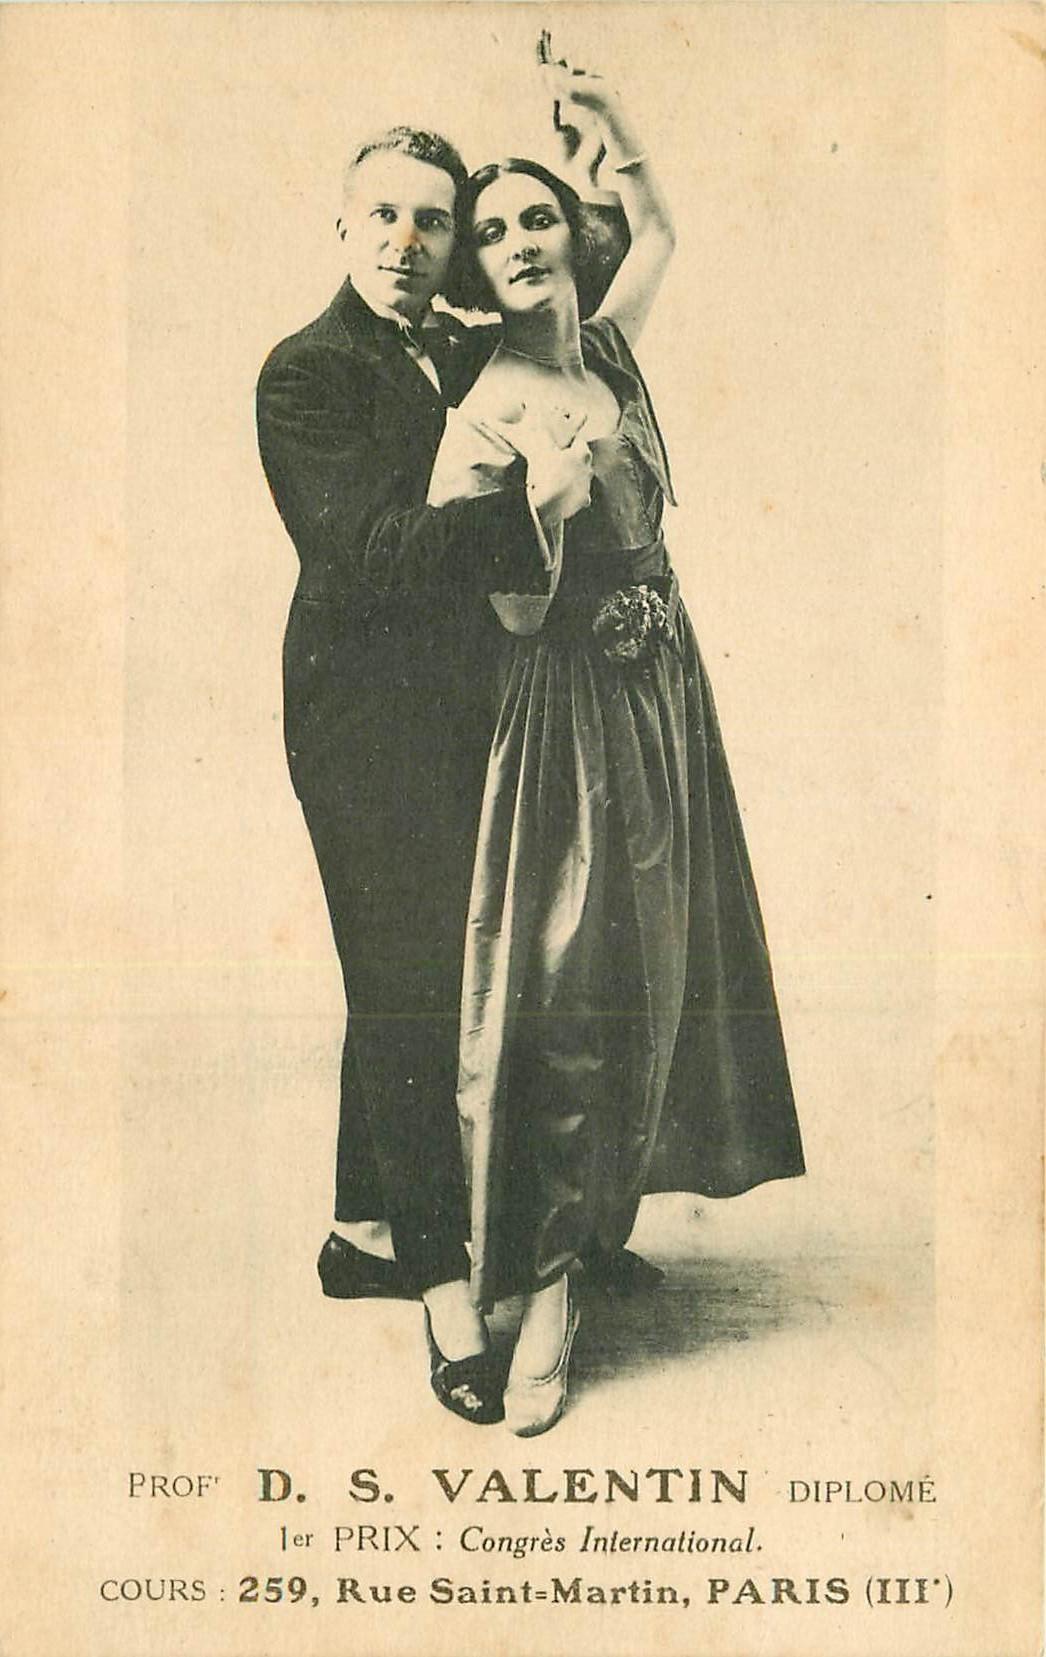 WW PARIS. Valentin Professeur de danse 259 rue Saint-Martin